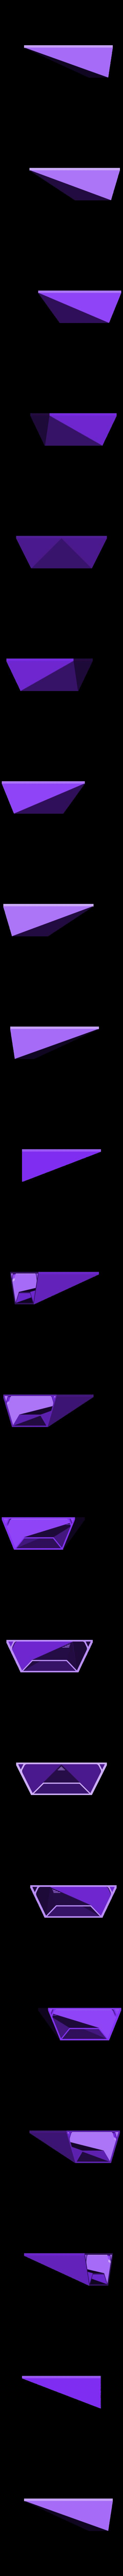 Fuze_Solid.stl Download free STL file Fuze Hanging Planter • 3D print model, MosaicManufacturing